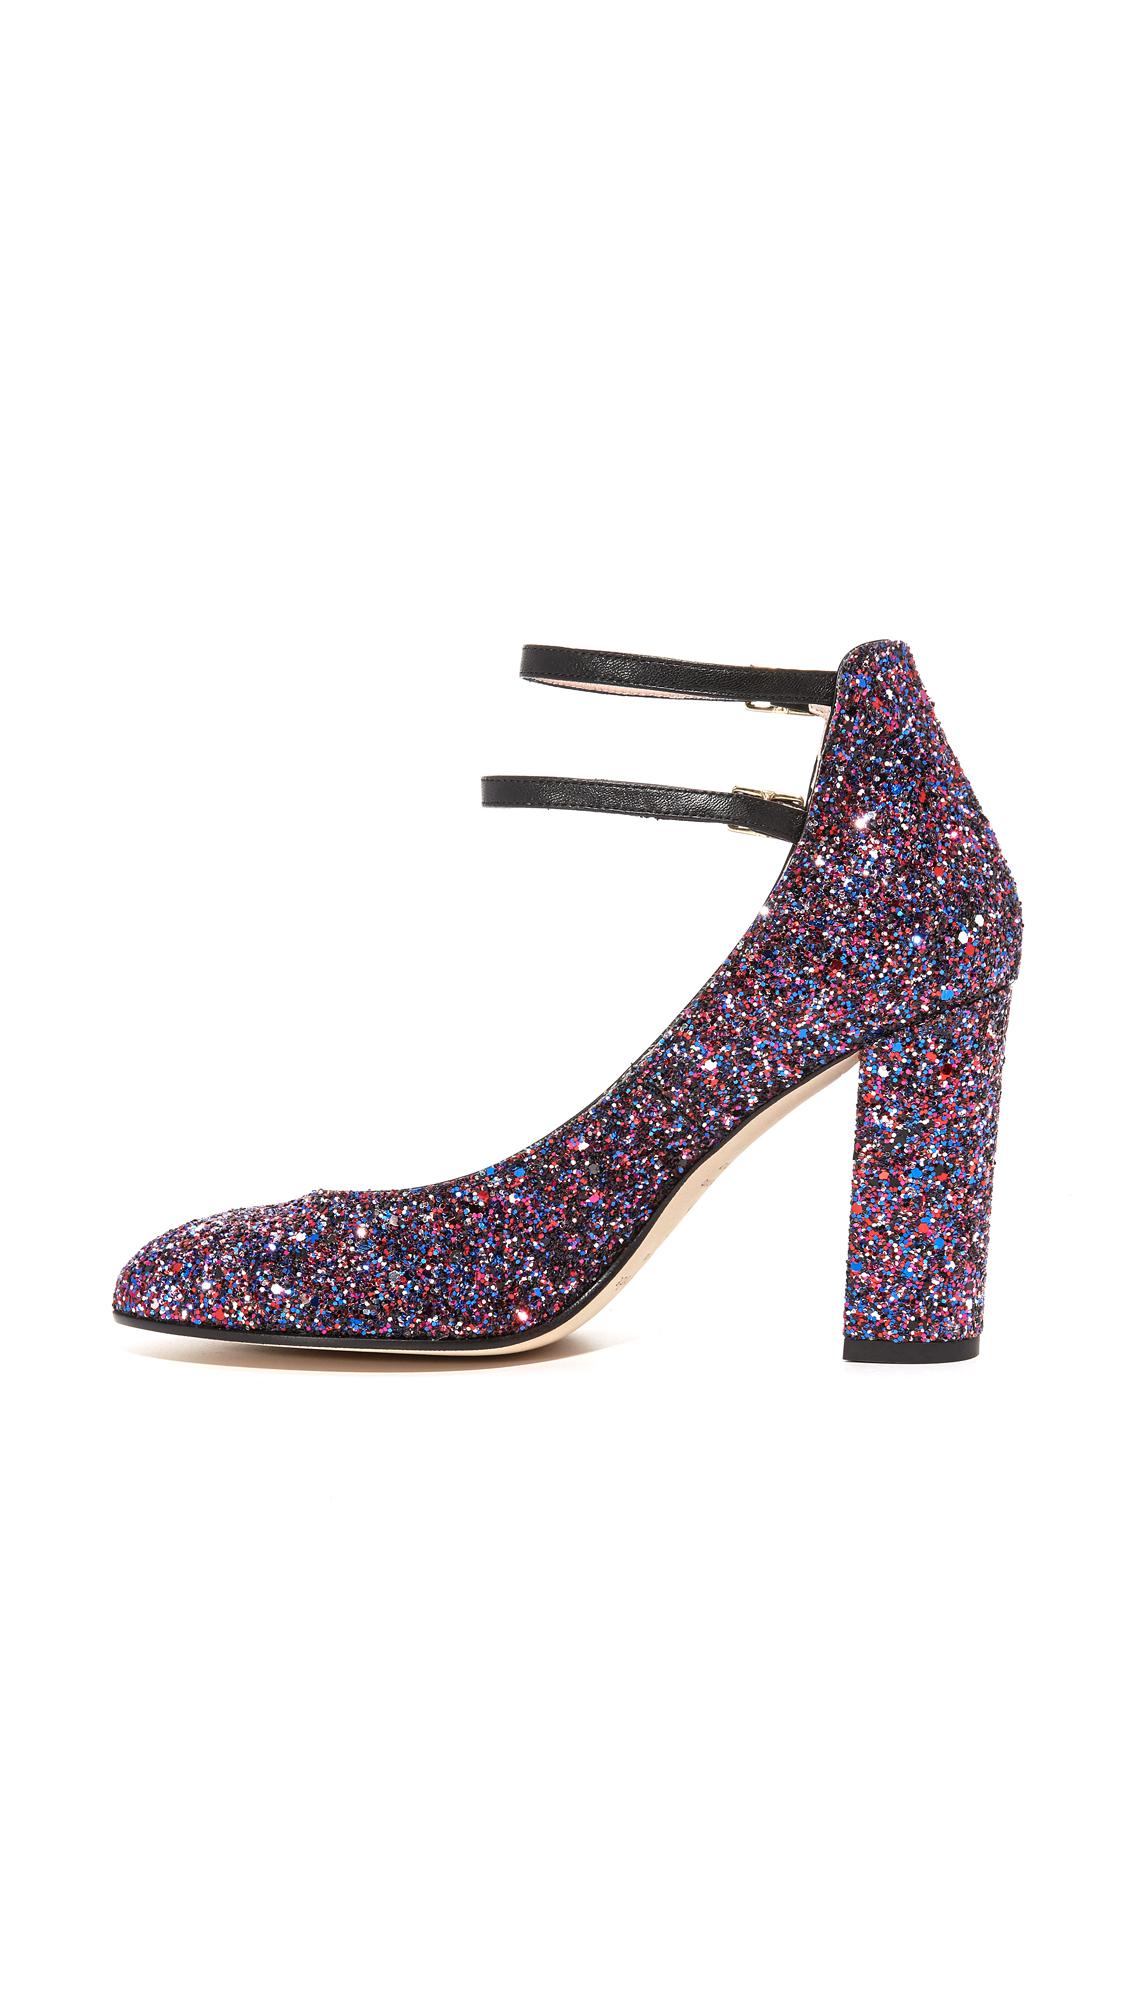 a47459d8a0cf Kate Spade New York Baneera Glitter Pumps